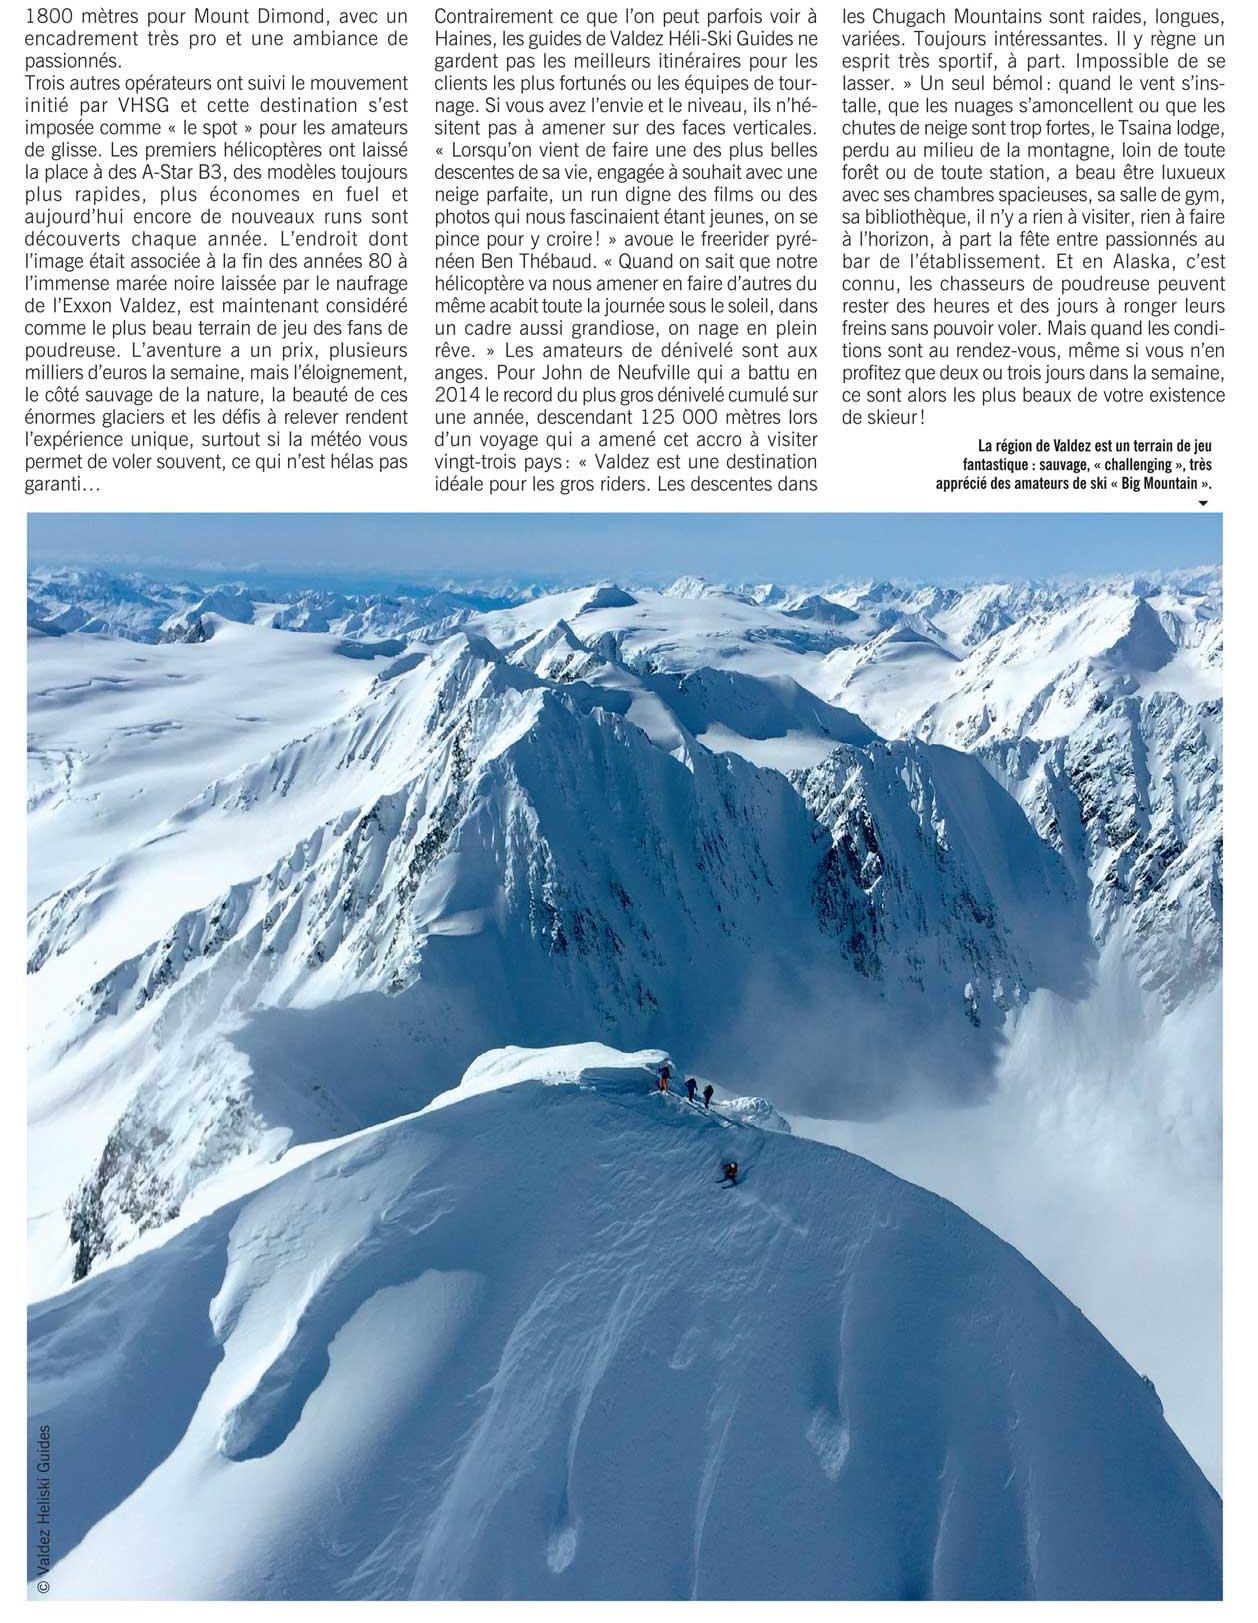 Article de presse revue spécialisée ski snowboard sports extrêmes Valdez Heli-Ski Guides Alaska